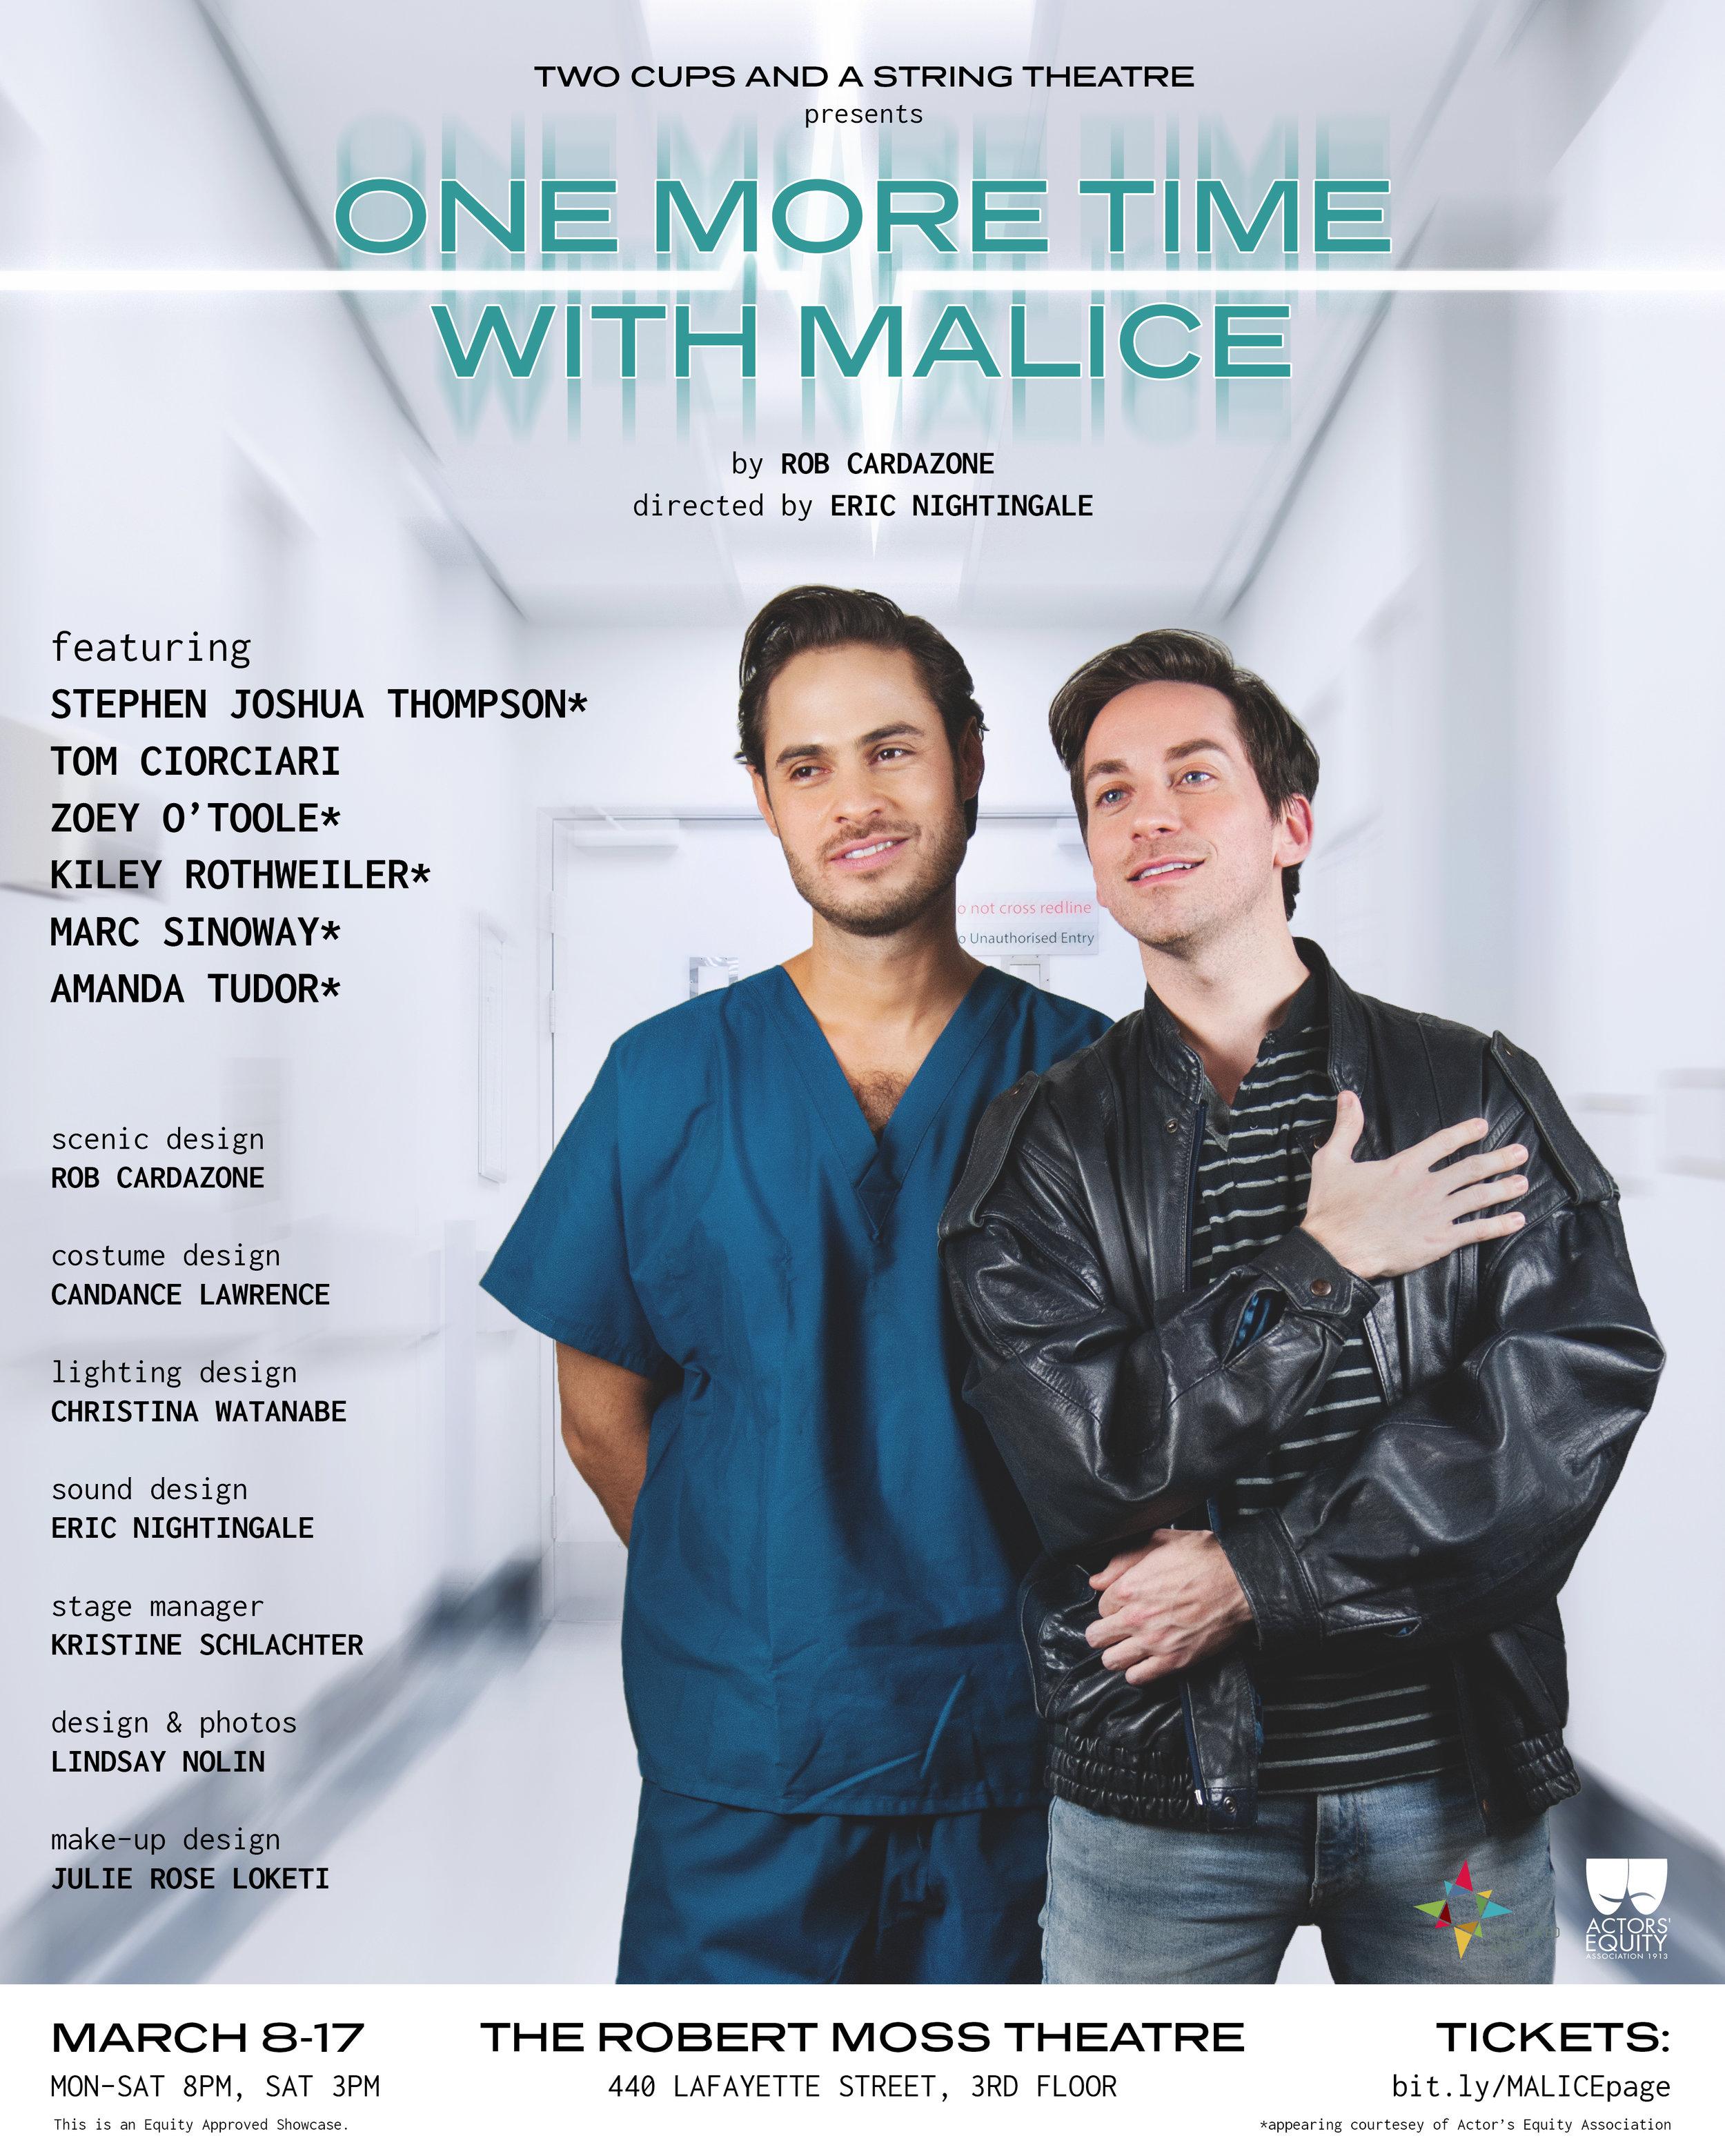 Stephen-Joshua-Thompson-Nurse.jpg